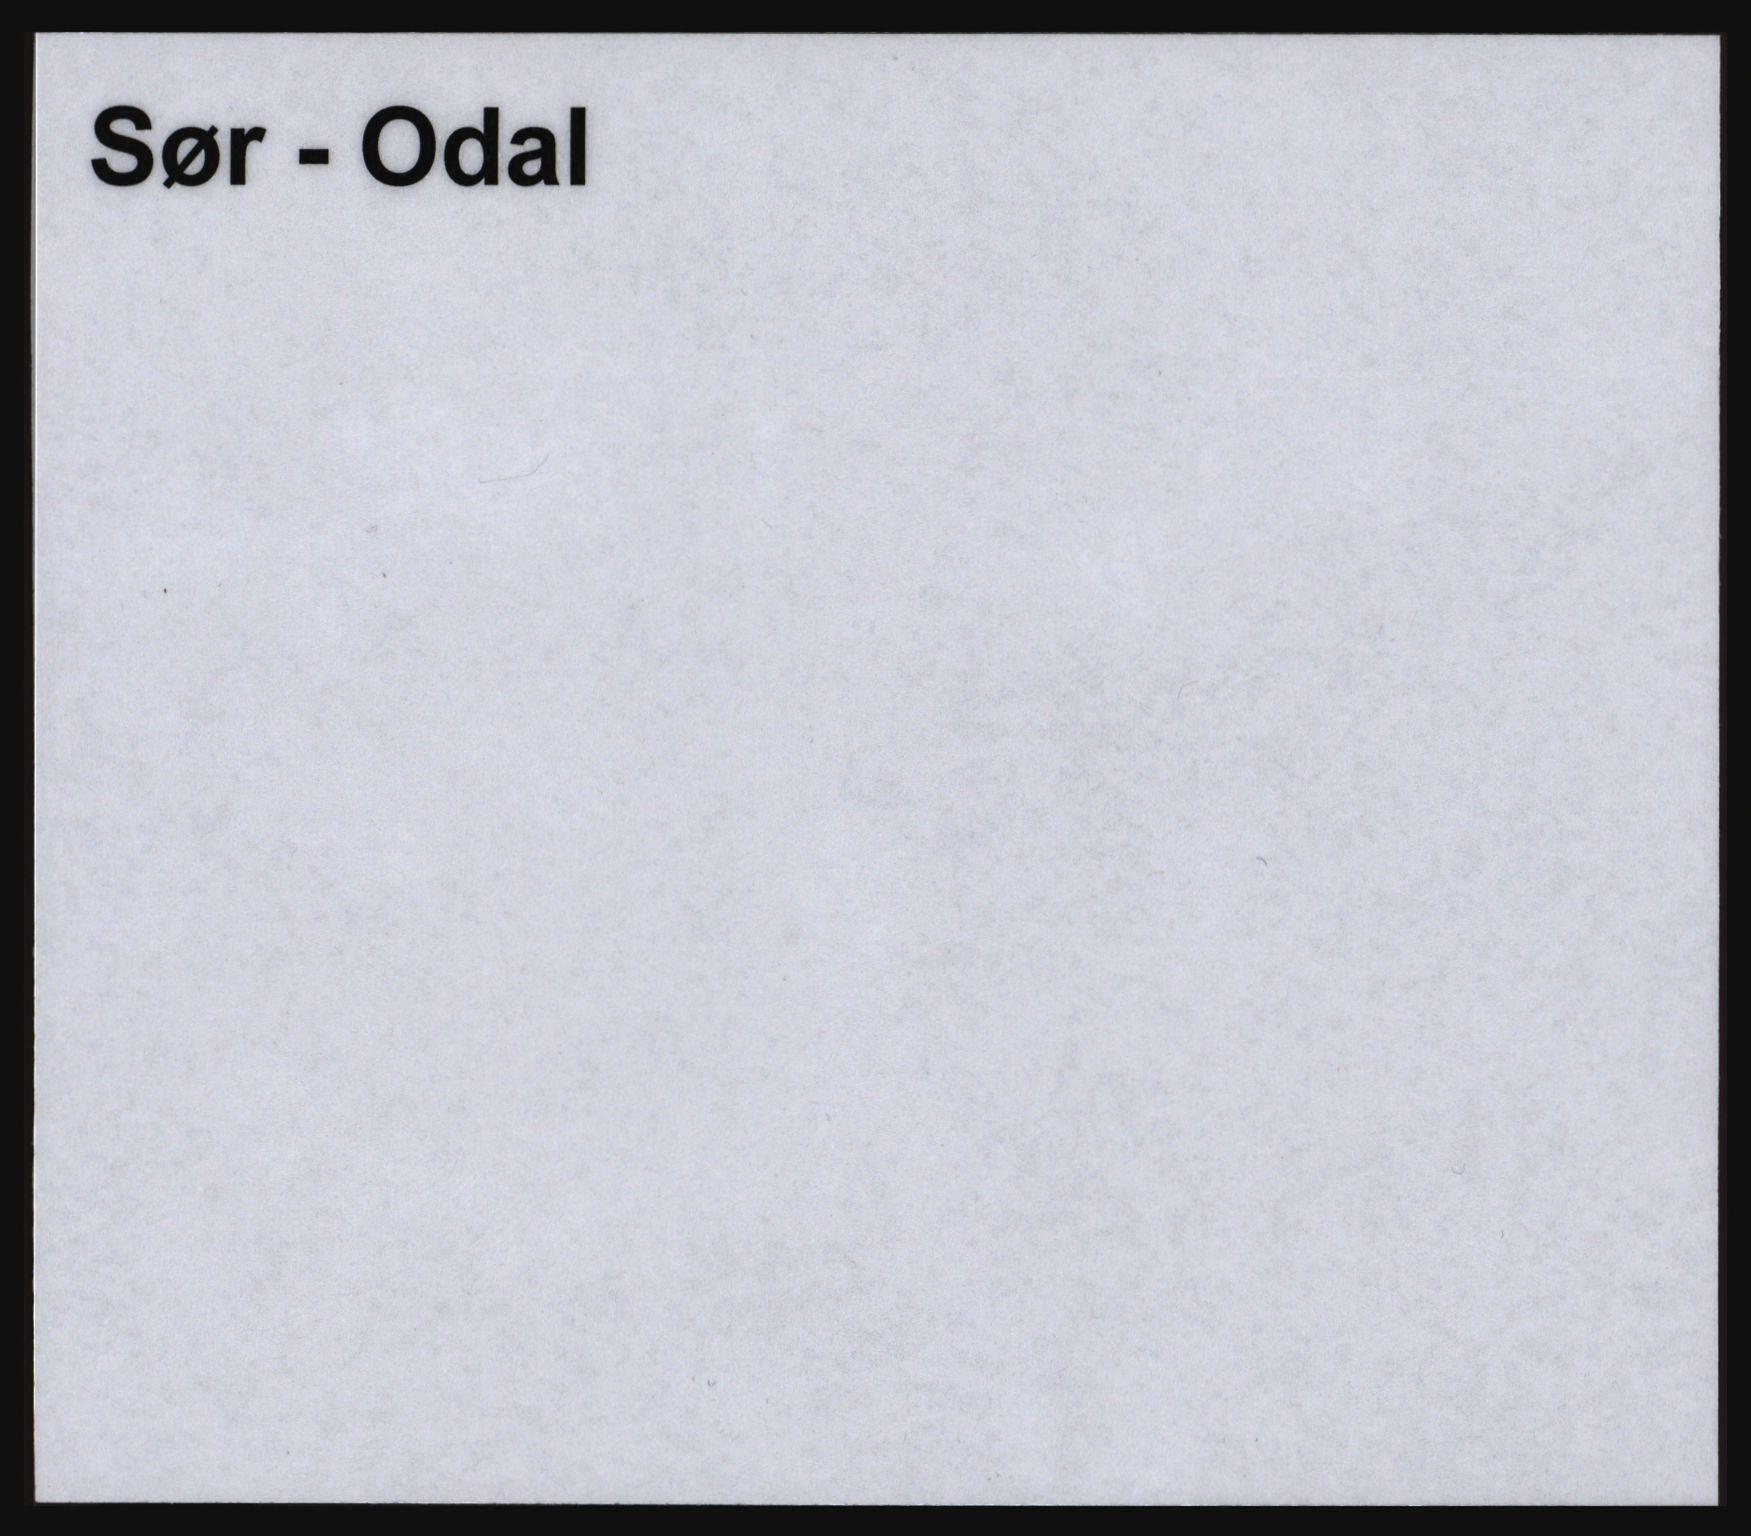 SAH, Norges Brannkasse, Sør-Odal, s. 1